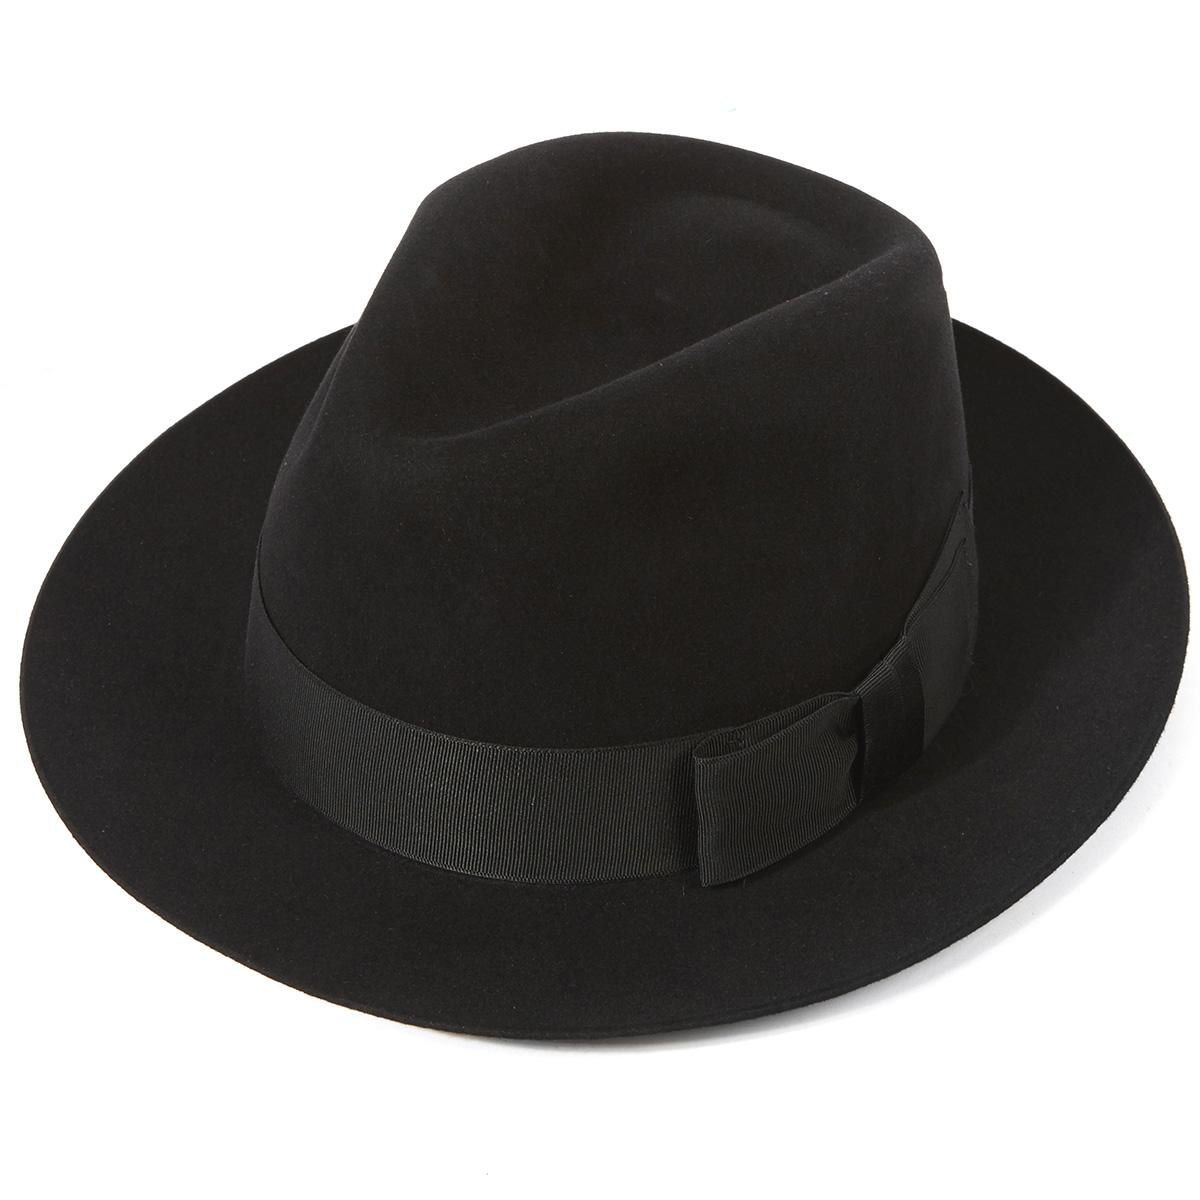 Bond Trilby - Black in size 56